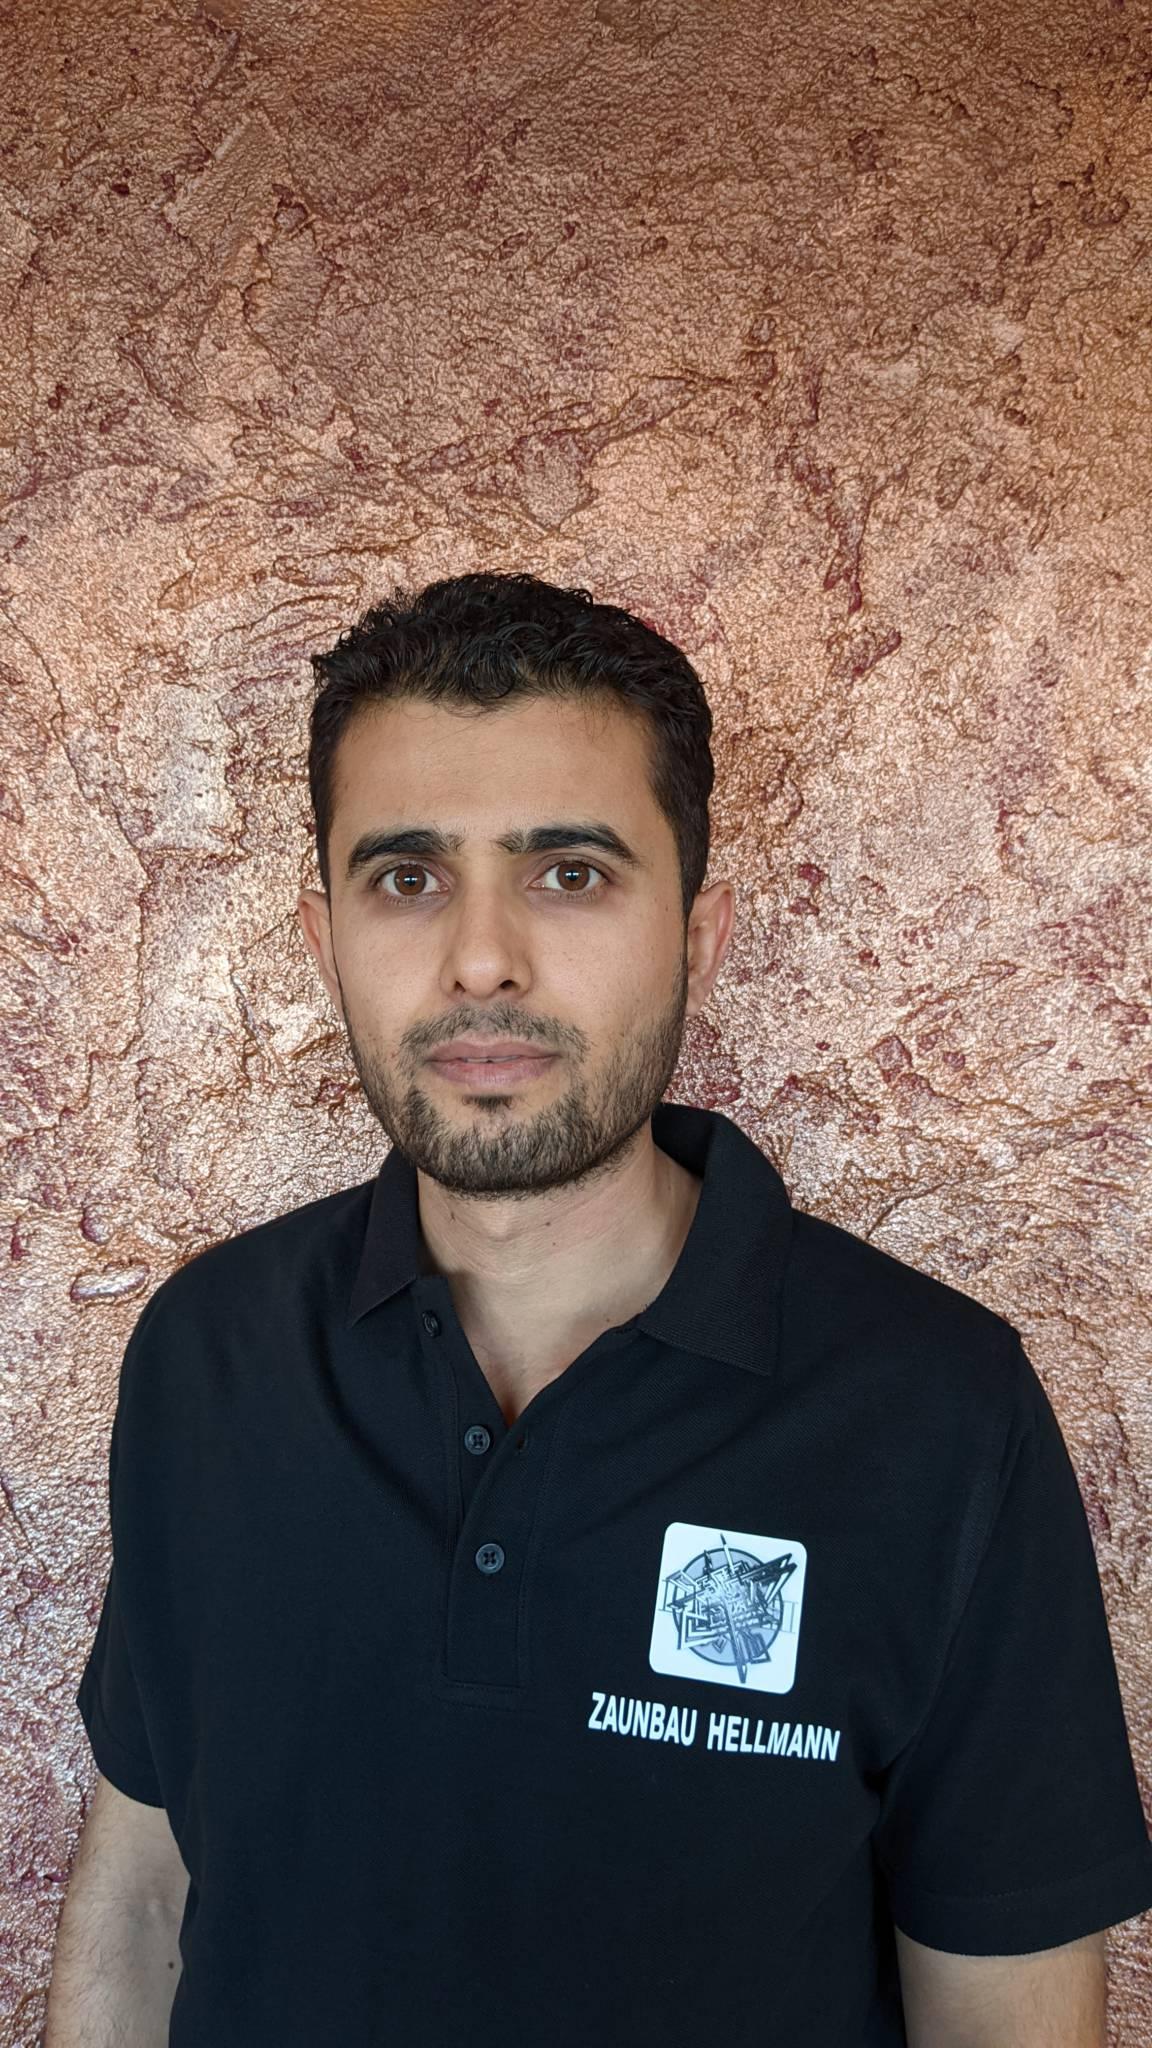 Ahmad Almohammad